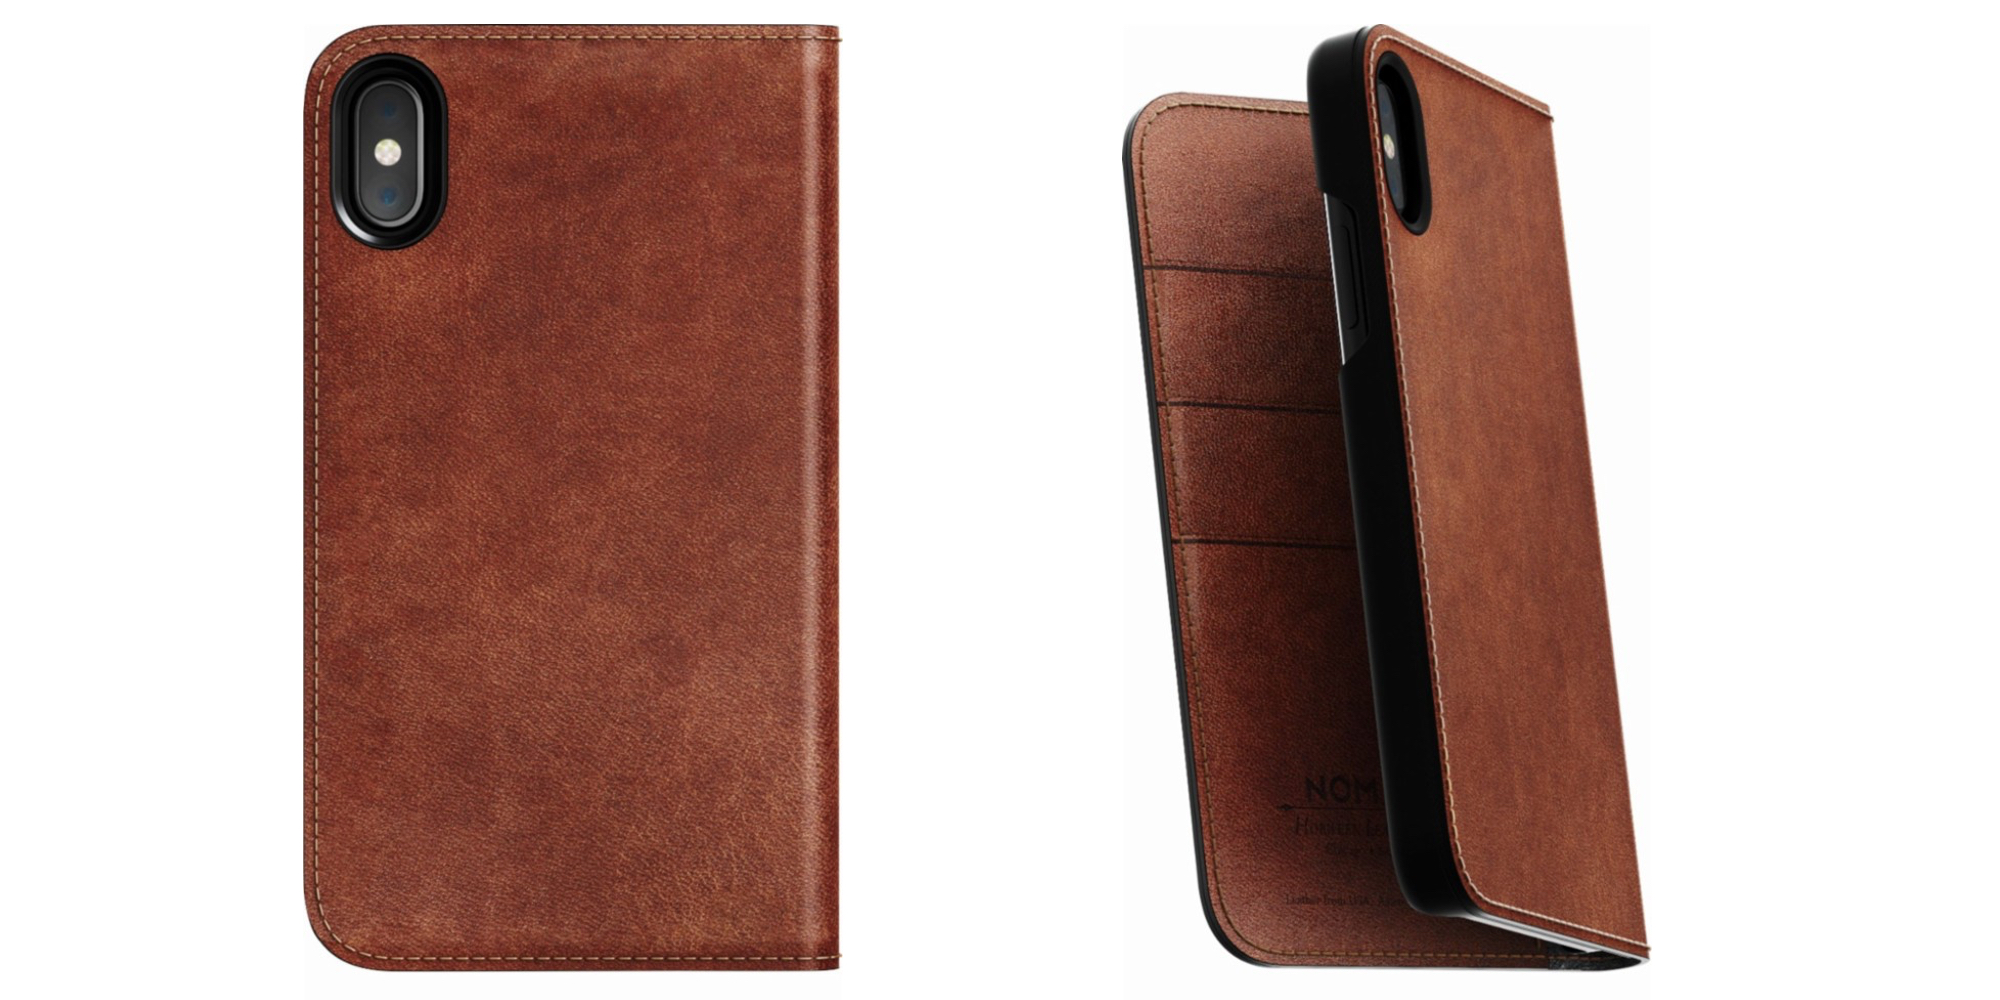 Smartphone Accessories: Nomad Leather Folio iPhone X/S Case $20, more